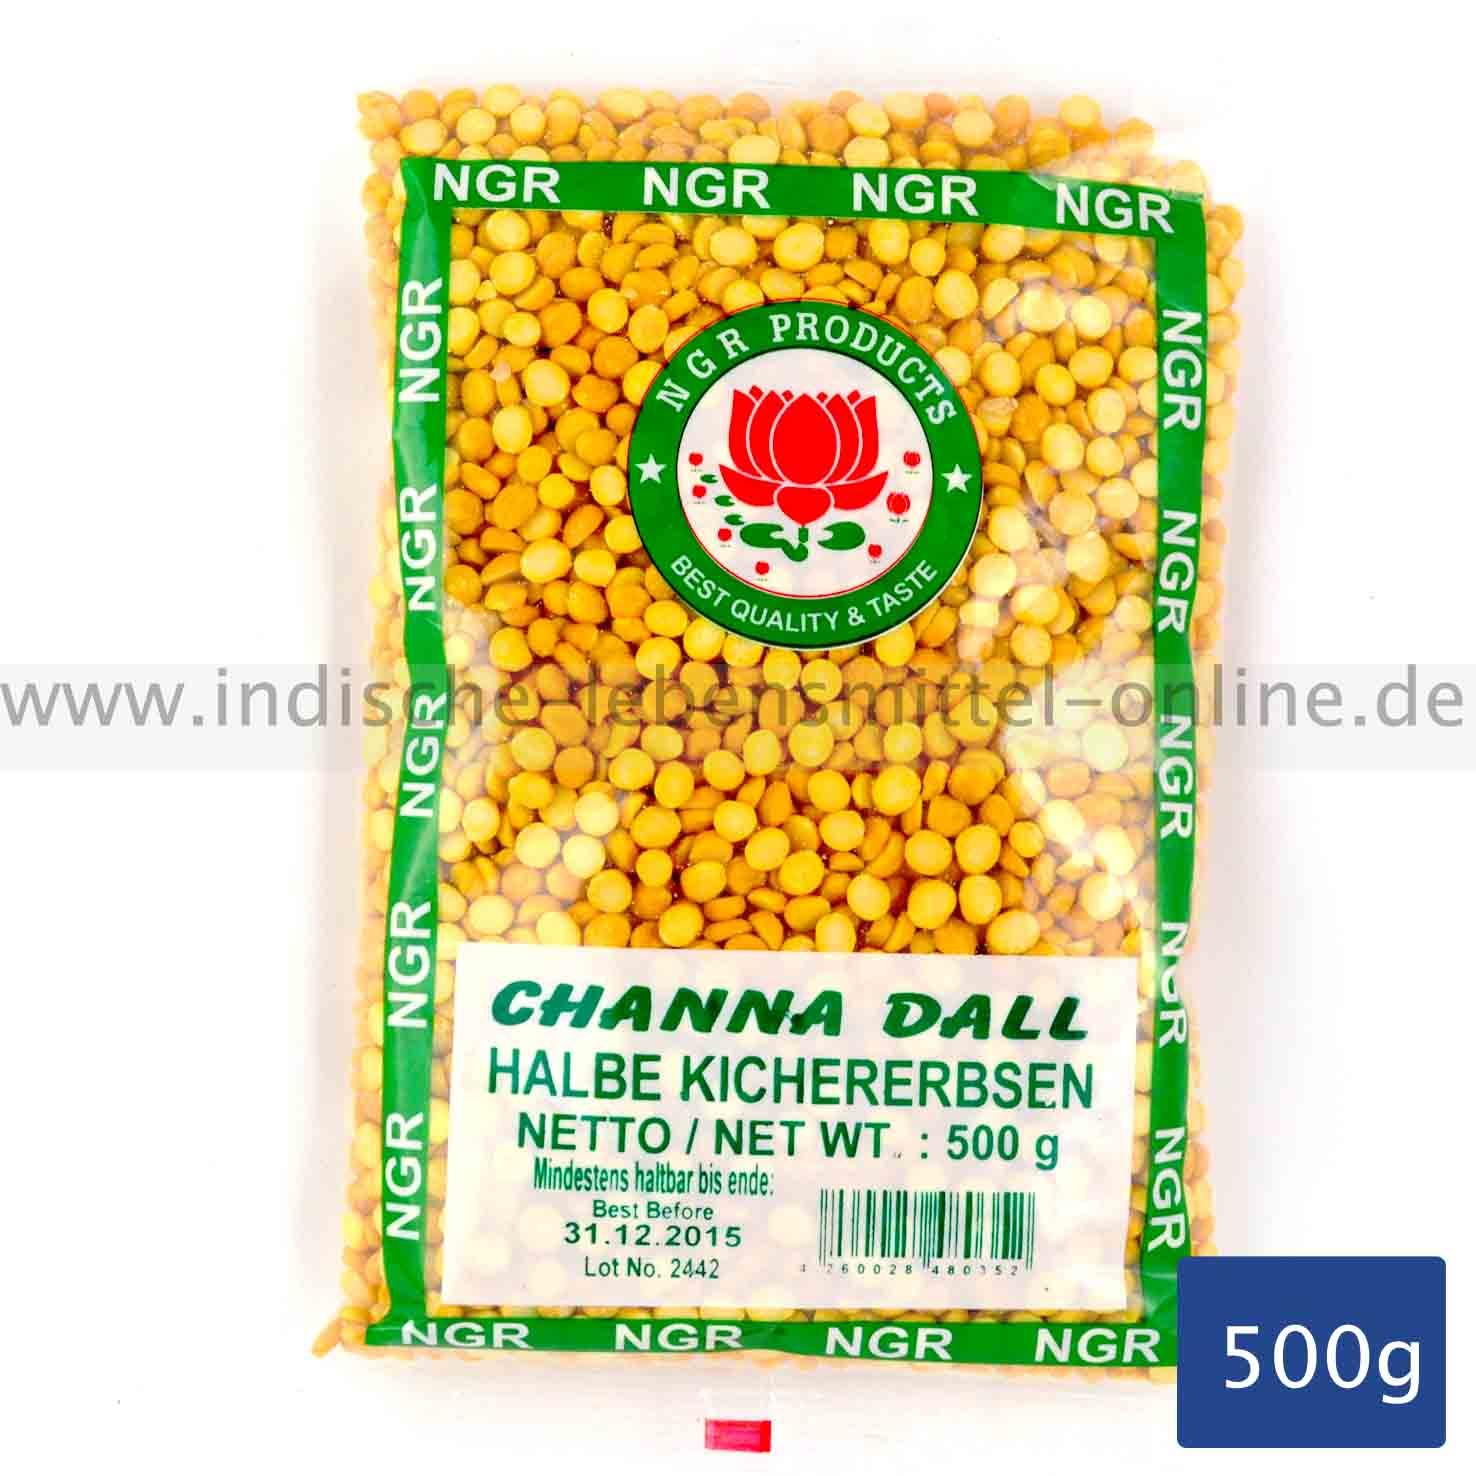 chana-dal-bengal-gram-kadalai-paruppu-channasplit-ngr-500g